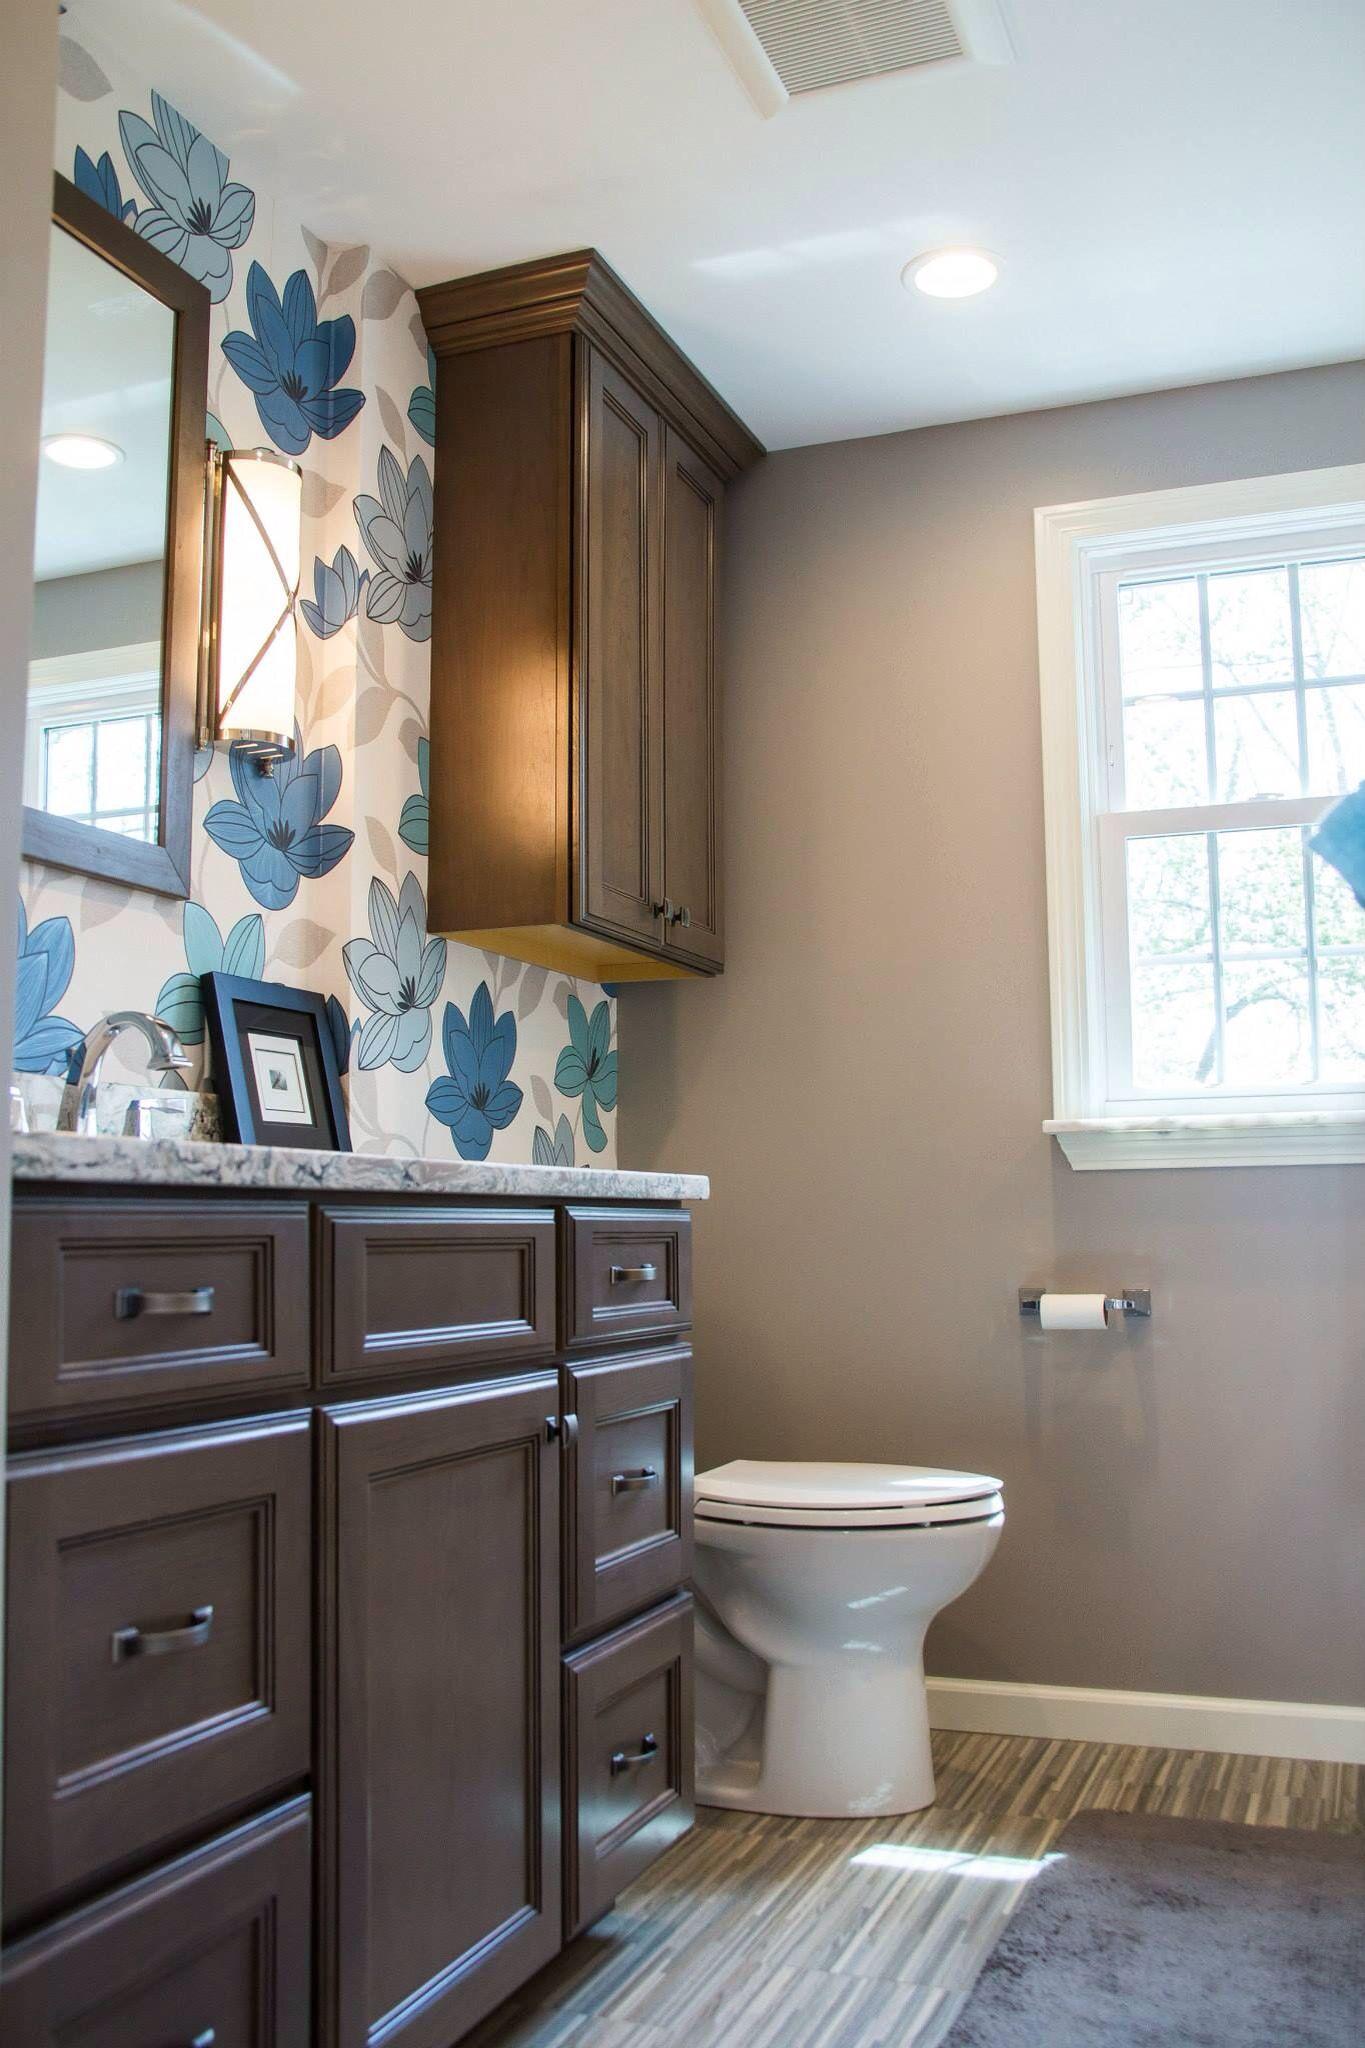 Finished! | Bathrooms remodel, Remodel, Home